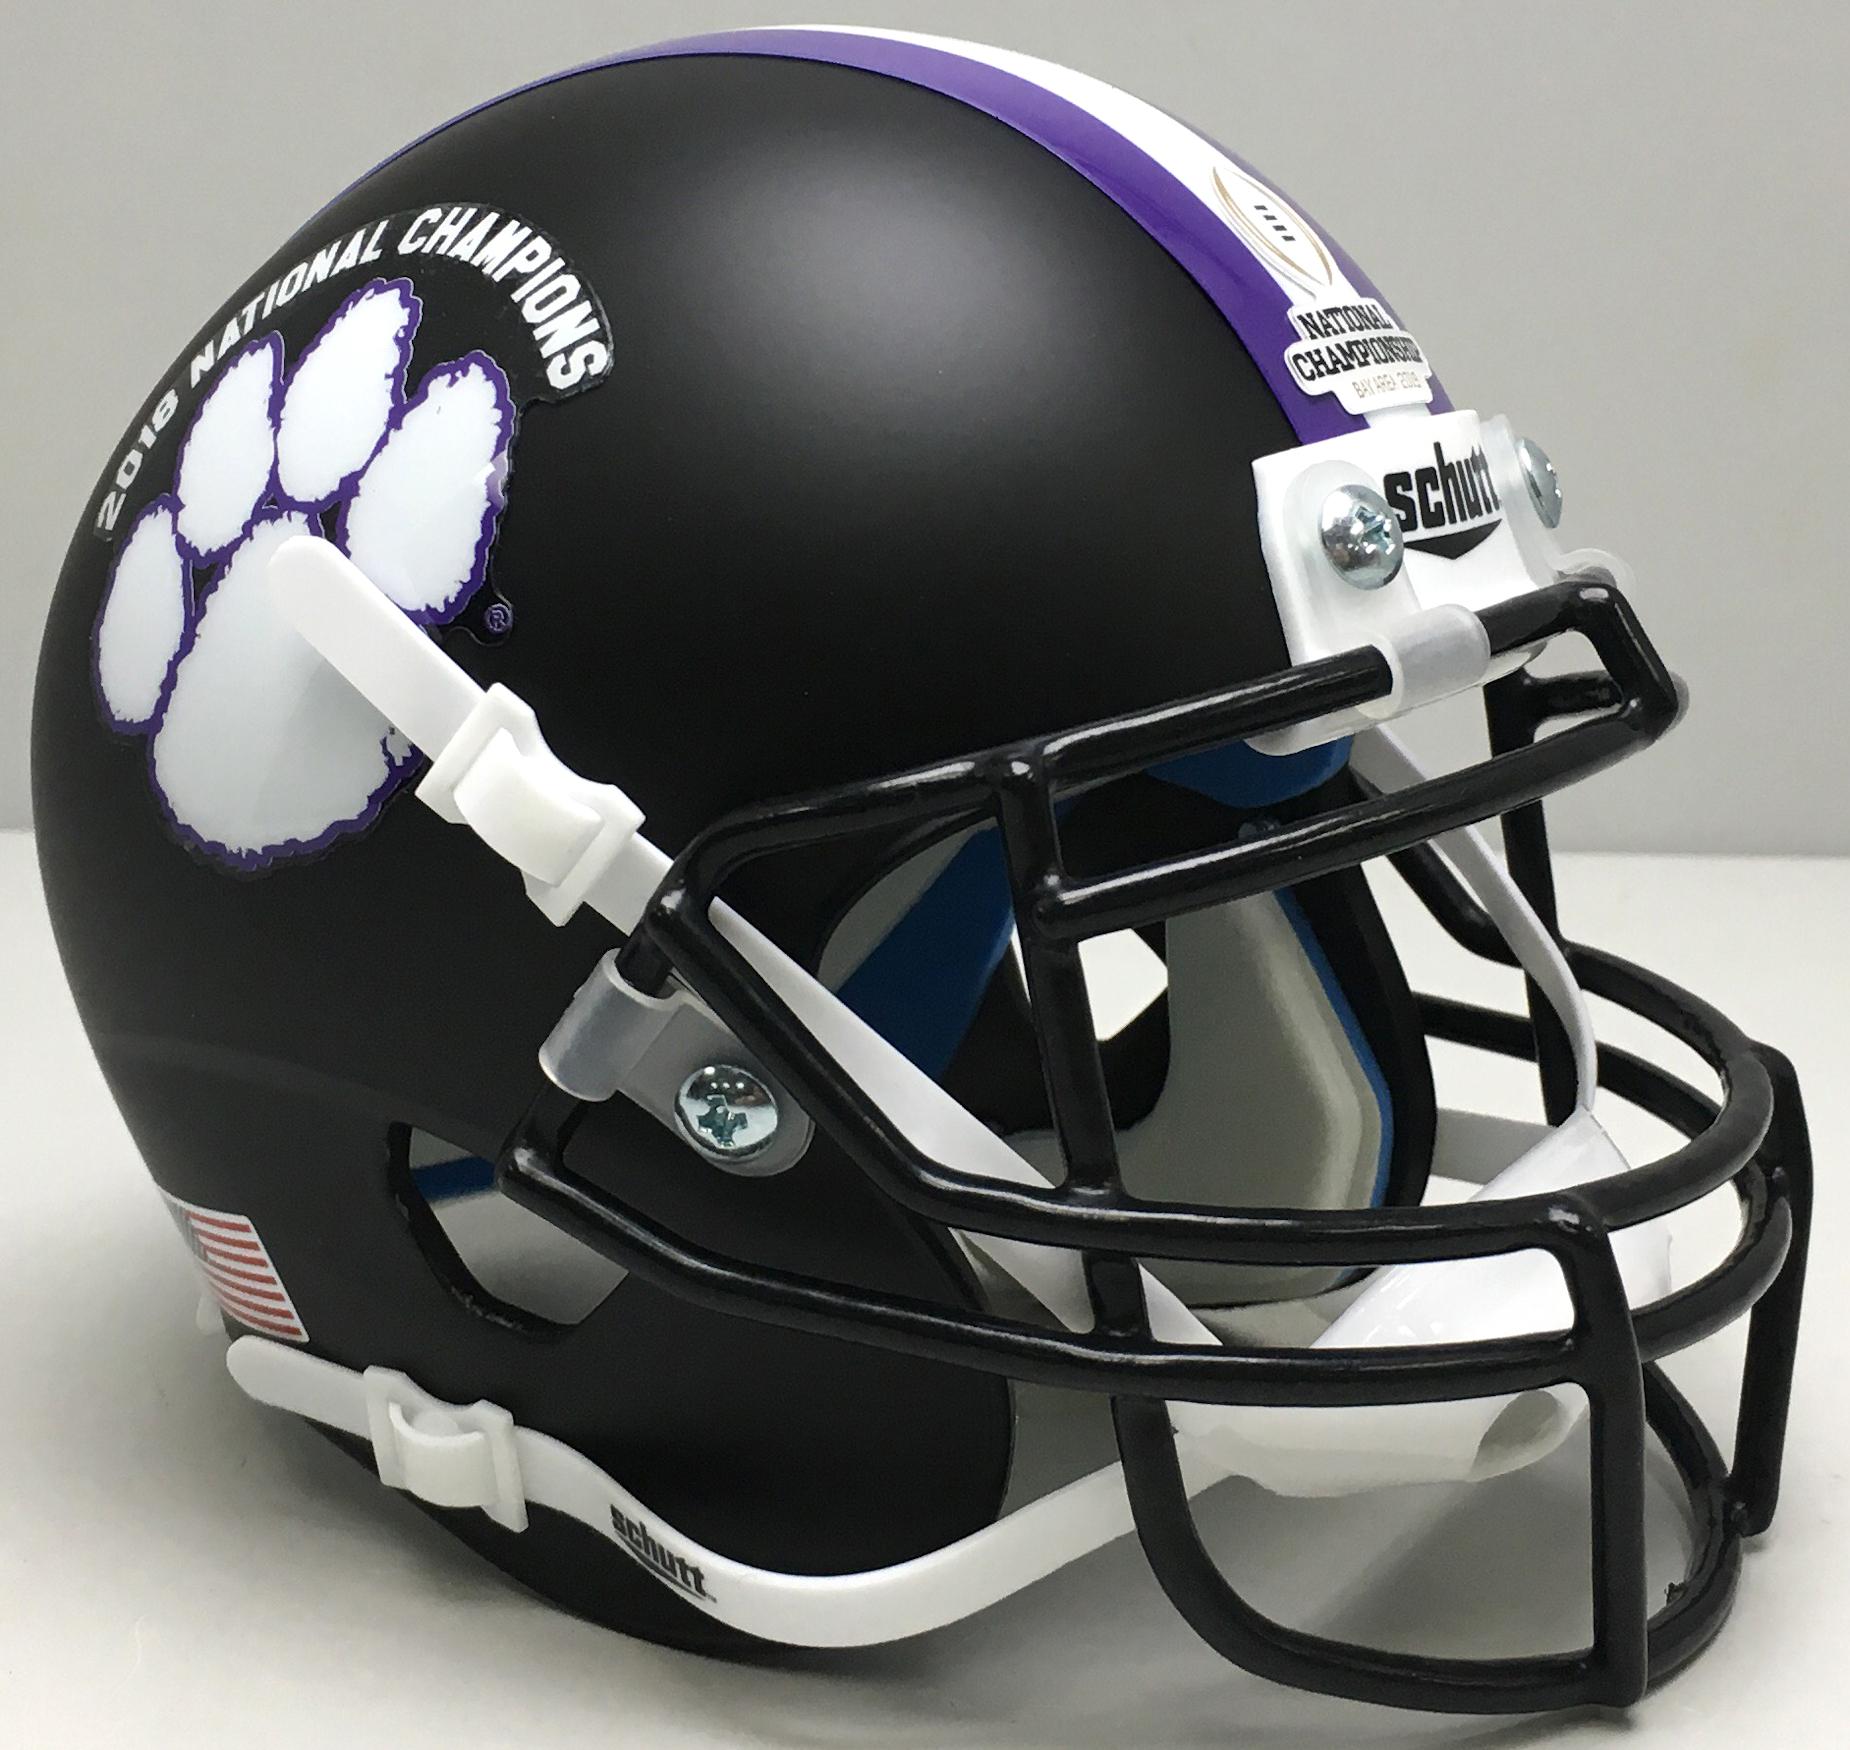 Clemson Tigers Authentic Football Helmet <B>2018 National Champs Matte Black</B>